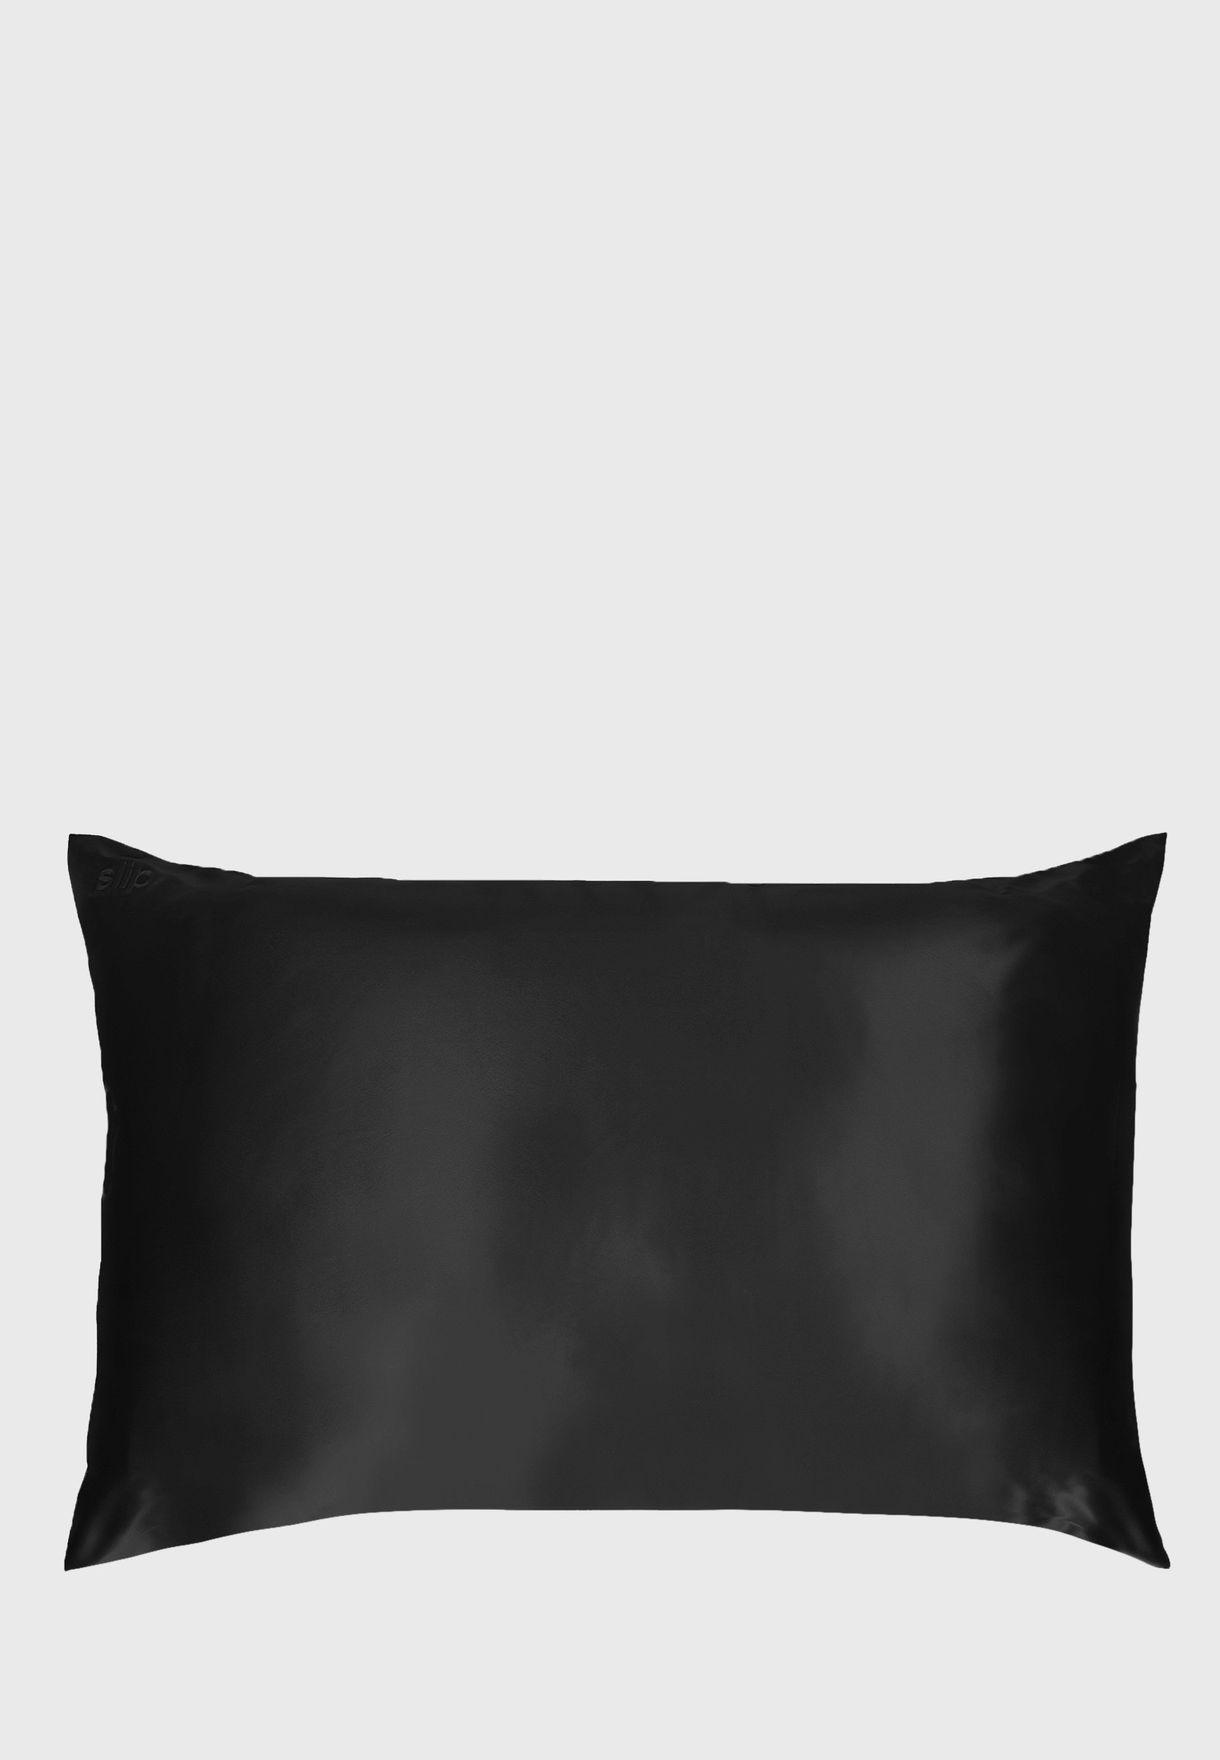 غطاء وسادة حريري كوين سايز - اسود